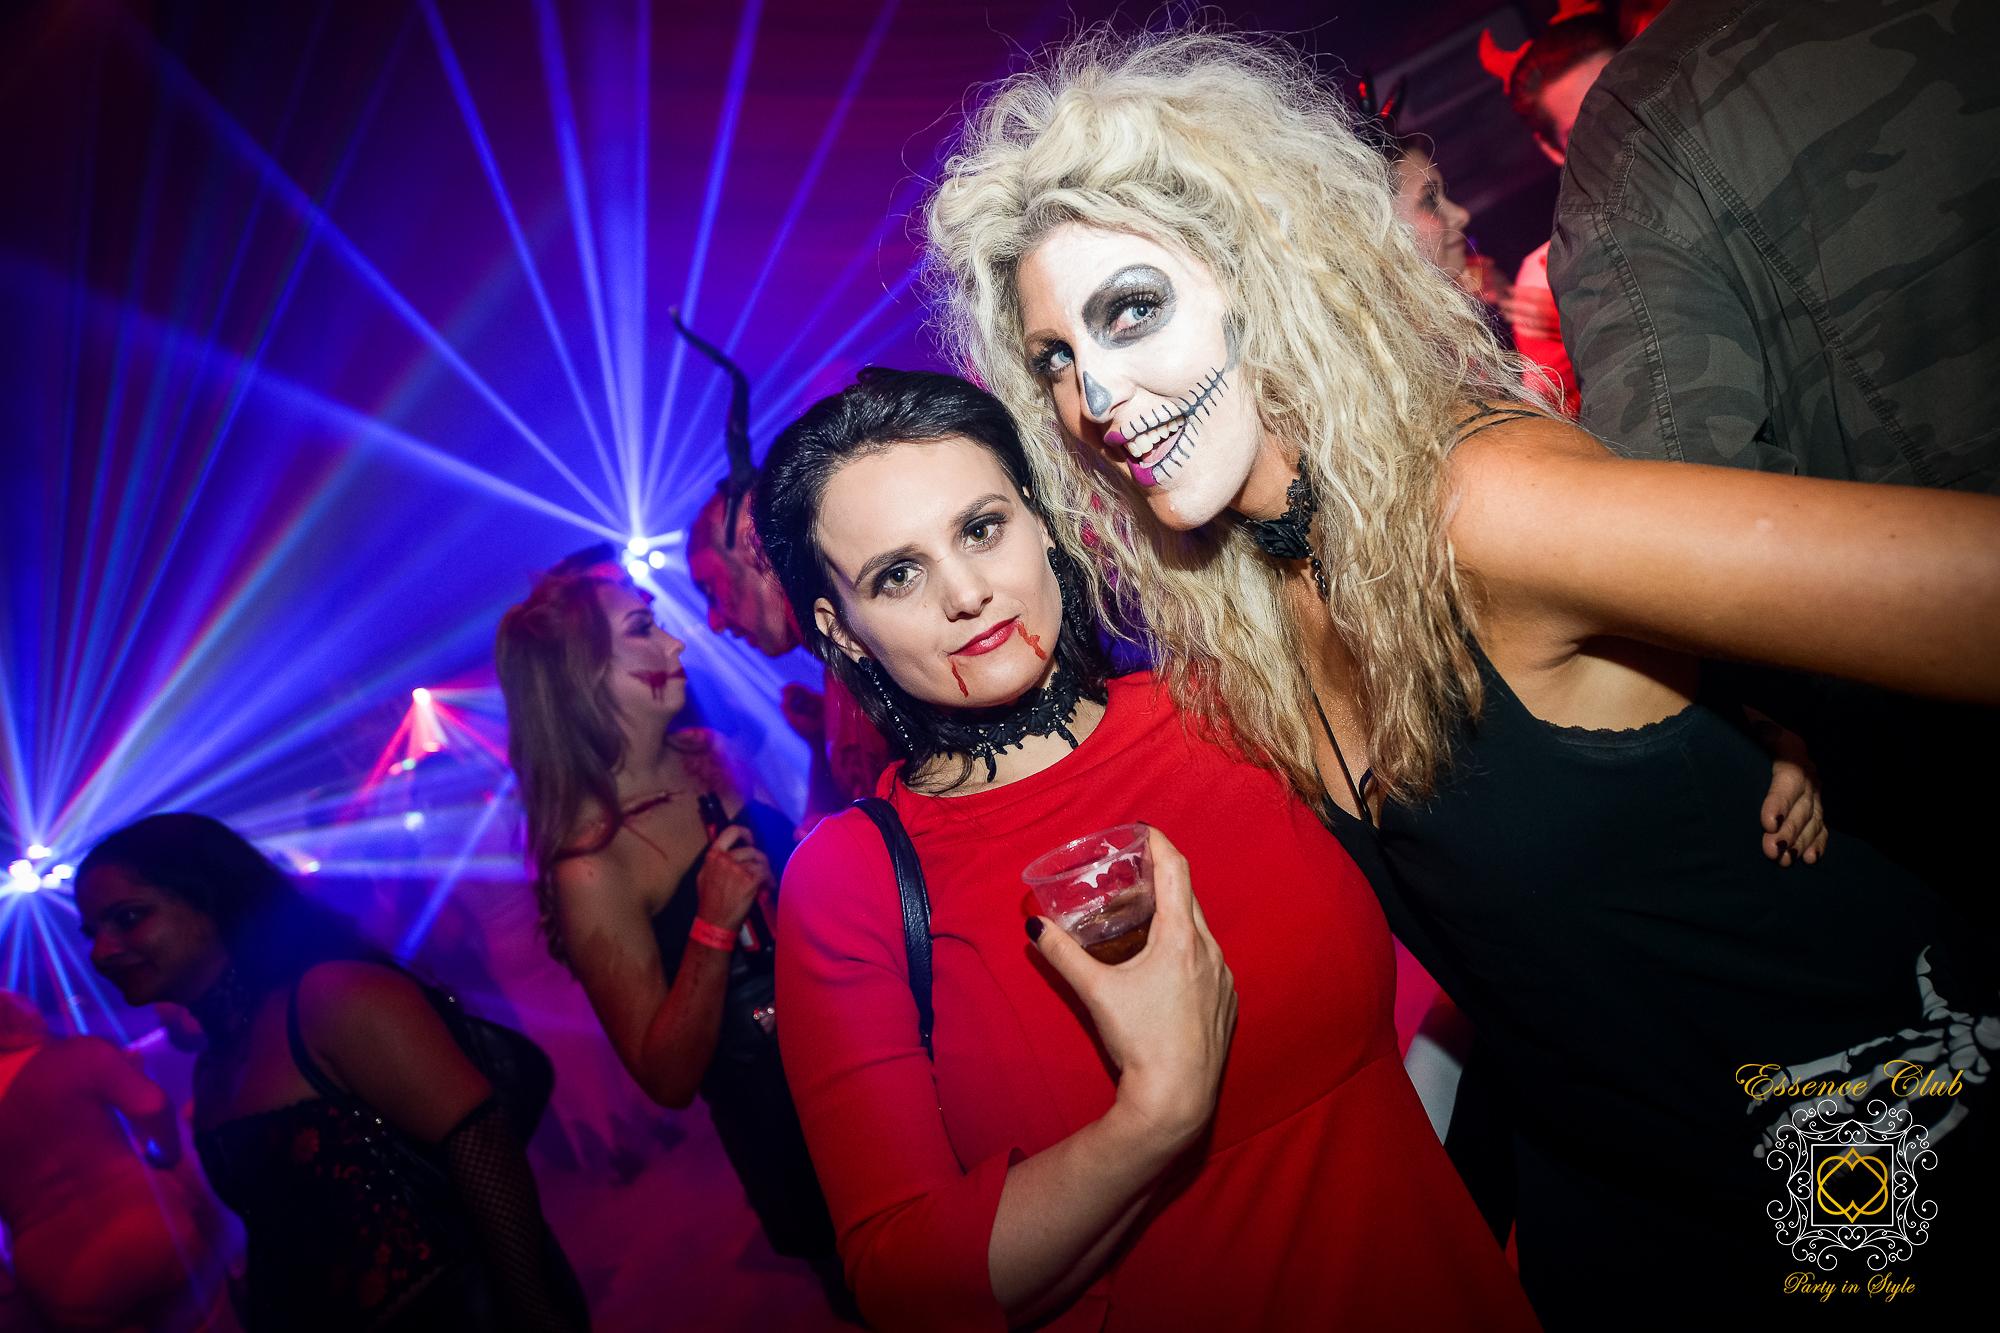 Essence club themed party night